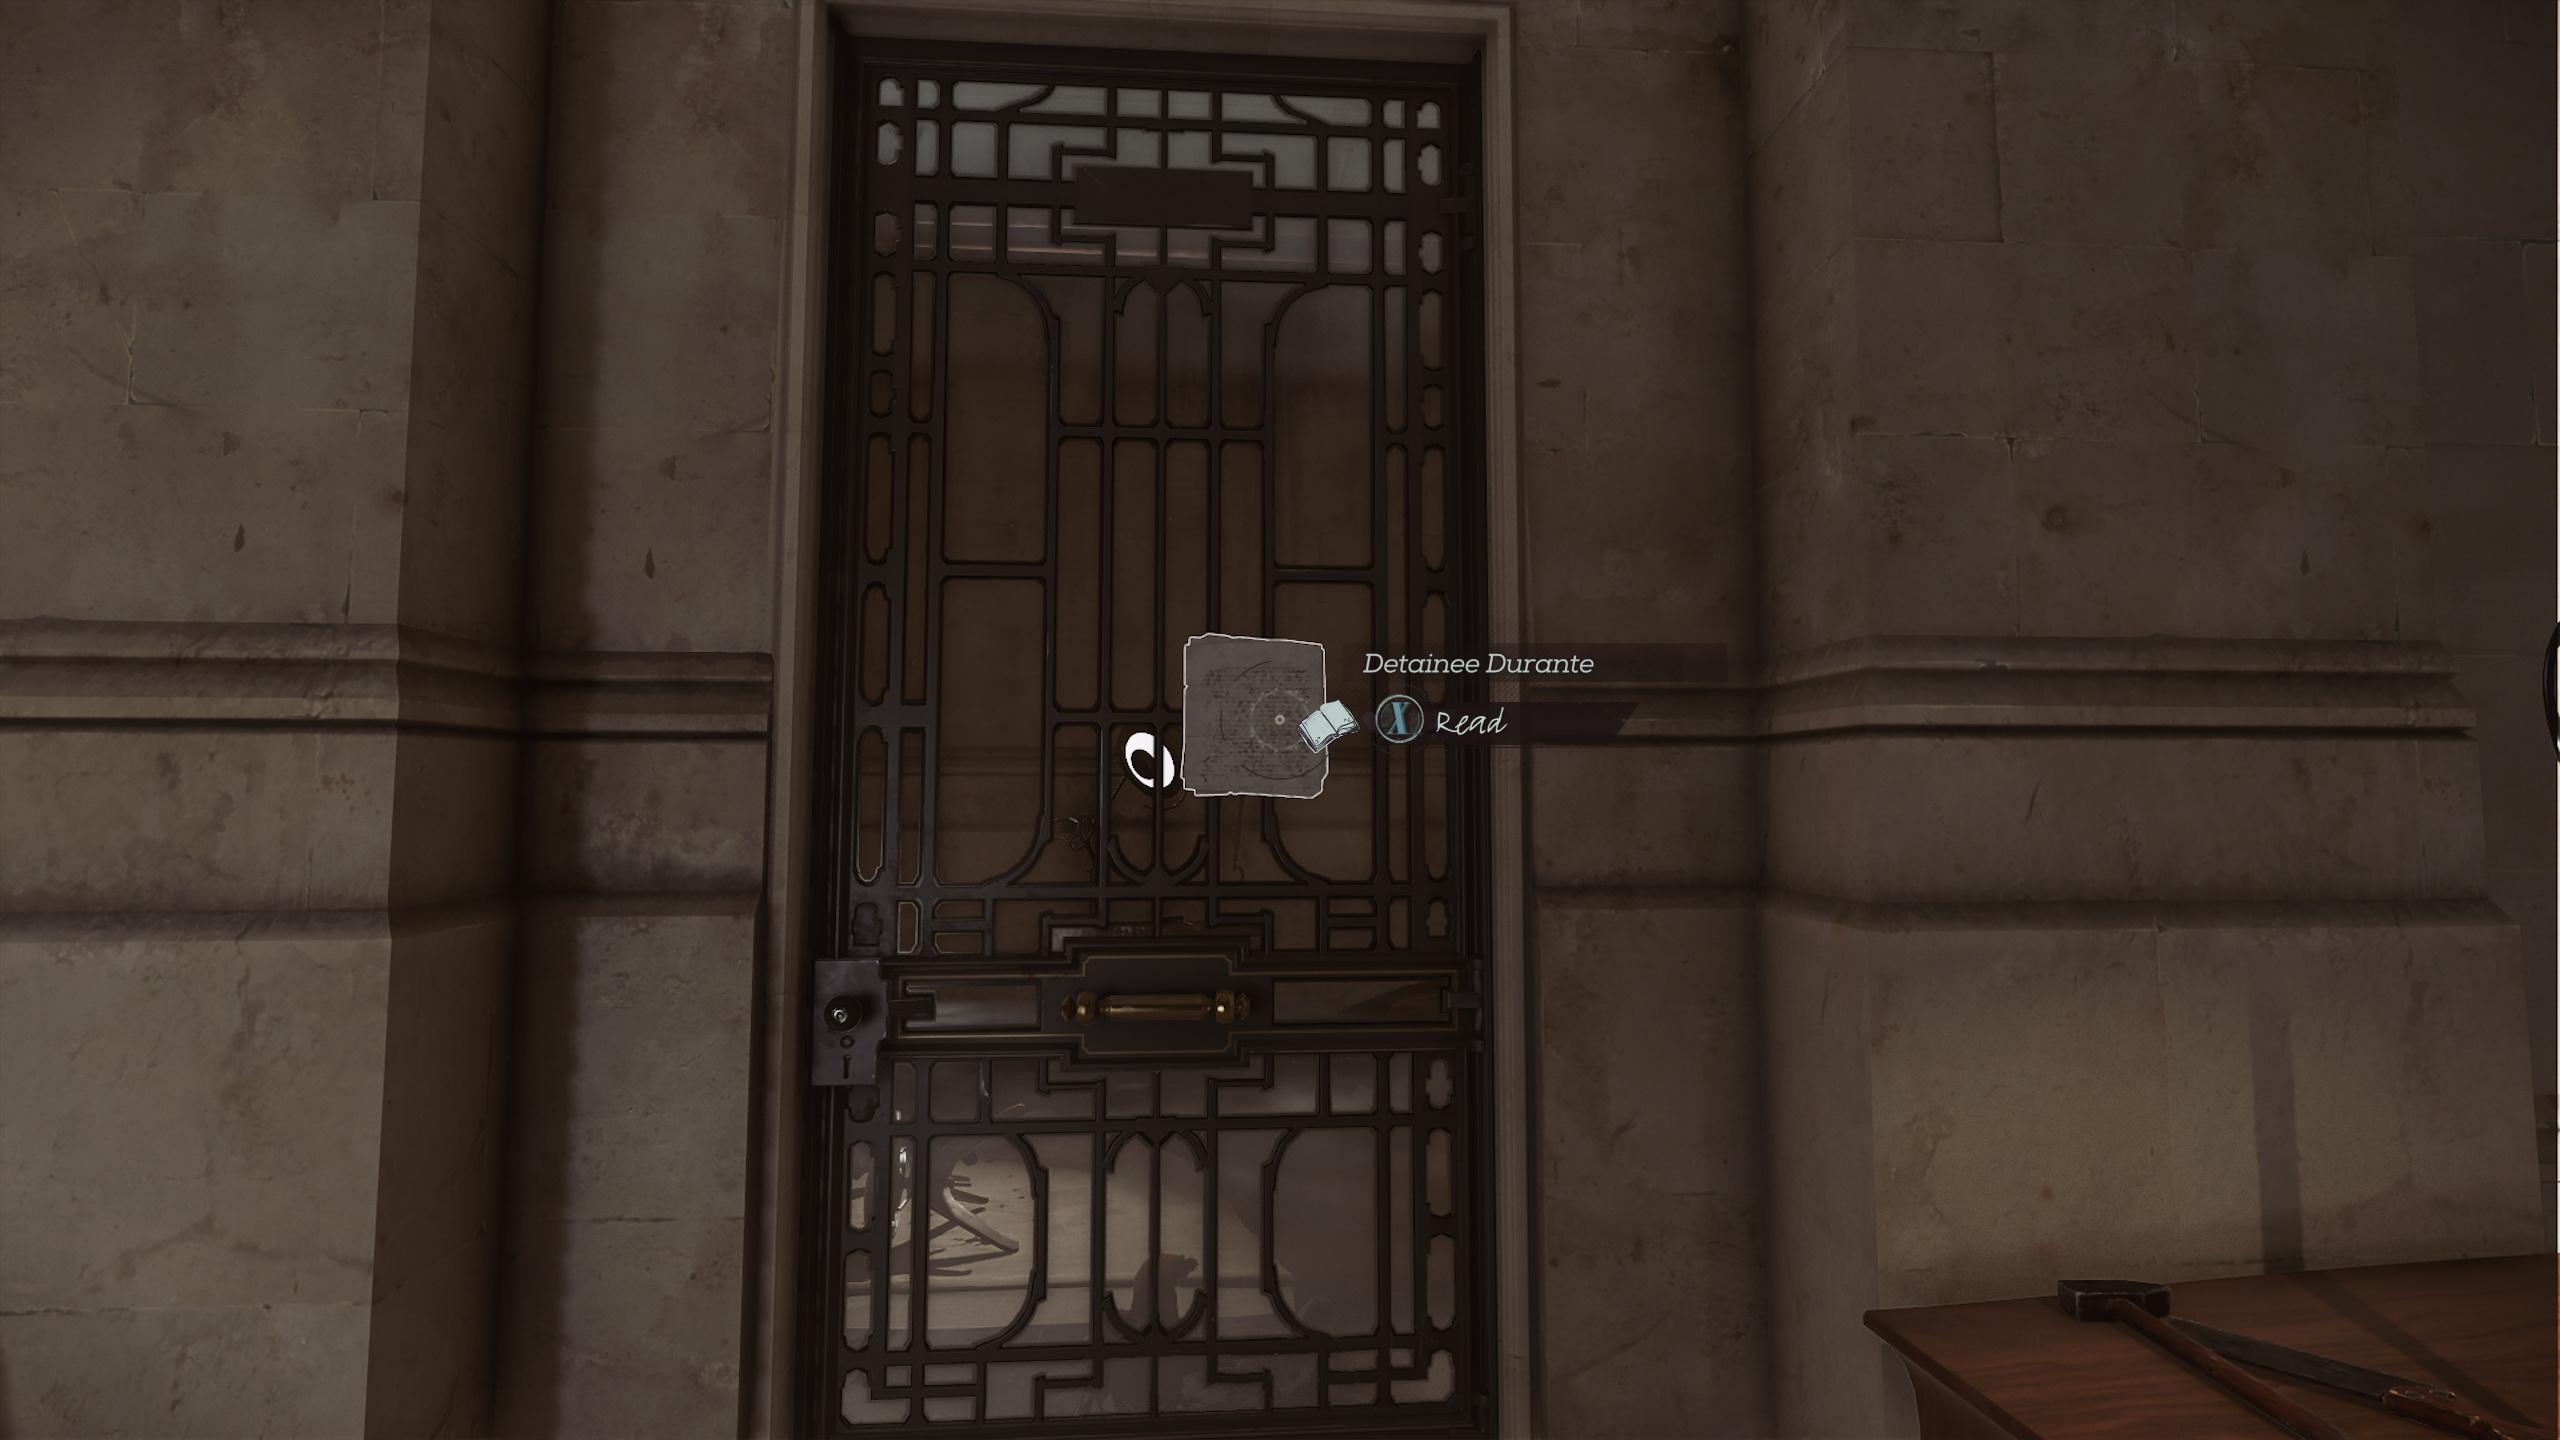 Detainee Durante